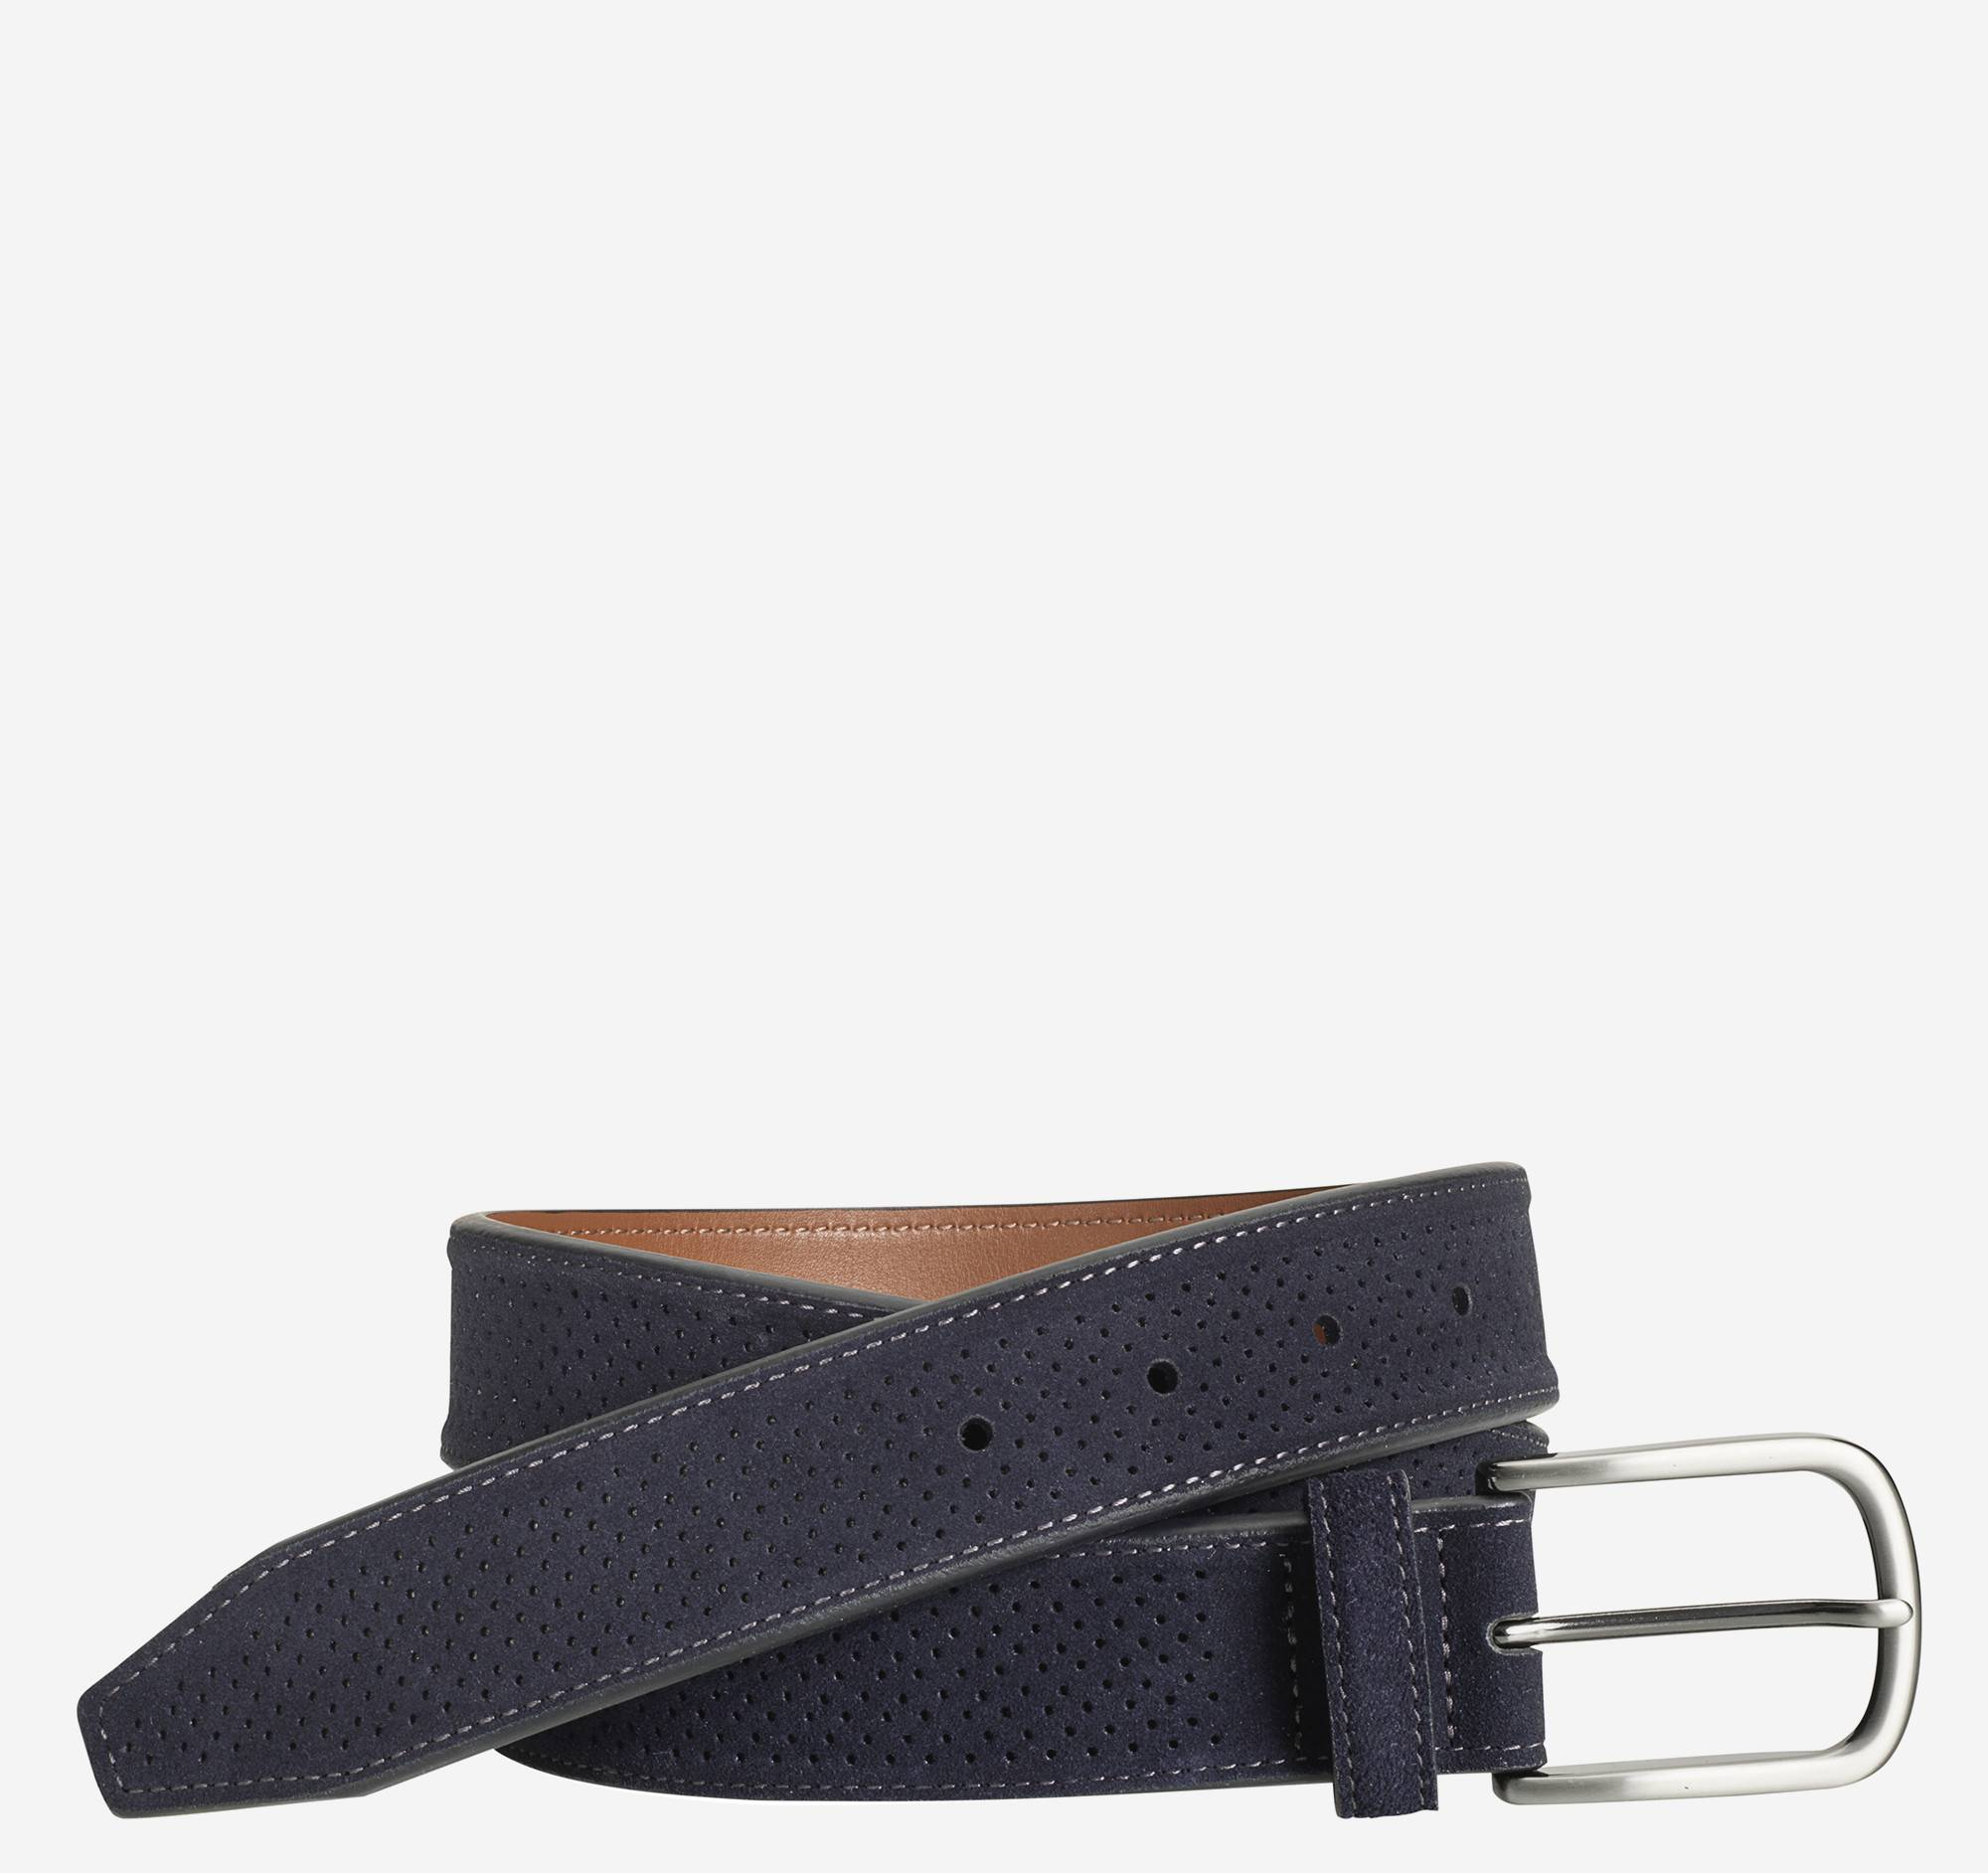 Johnston & Murphy Men's Perfed Suede Belt - Navy - Size 34